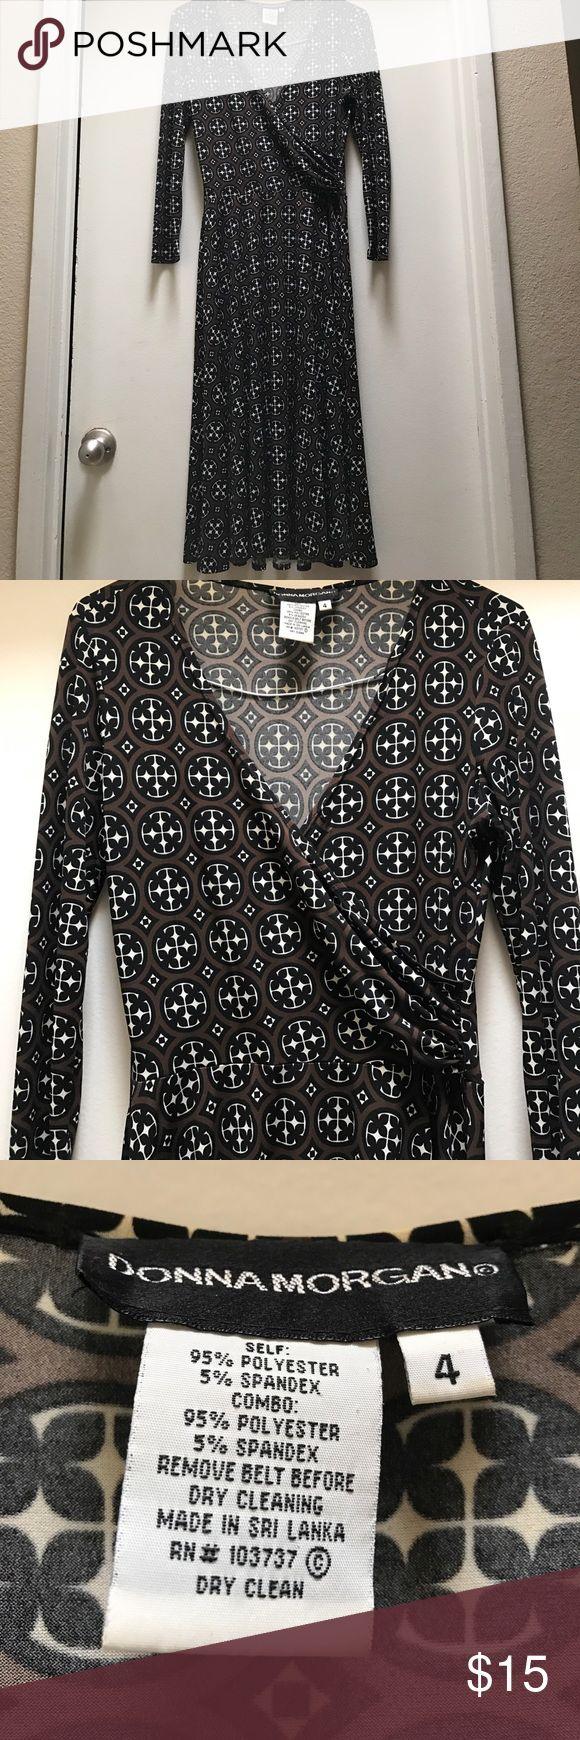 Donna Morgan Dress Donna Morgan Dress. Gently used. Size 4. Donna Morgan Dresses